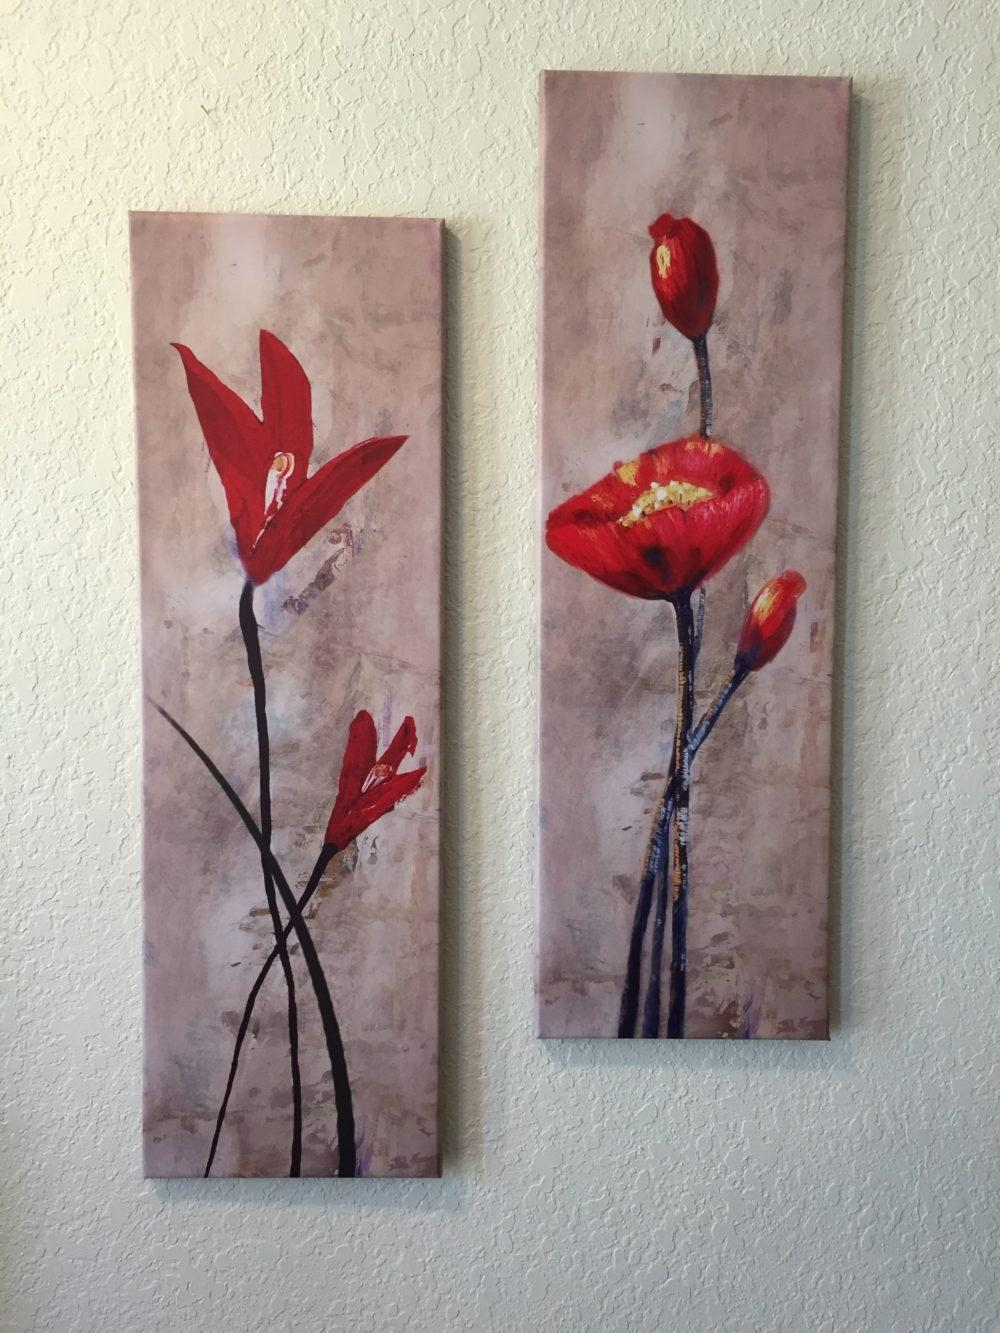 Flowers Composition Vertical Painting 2 Piece Wall Art Regarding 4 Piece Wall Art (View 18 of 19)